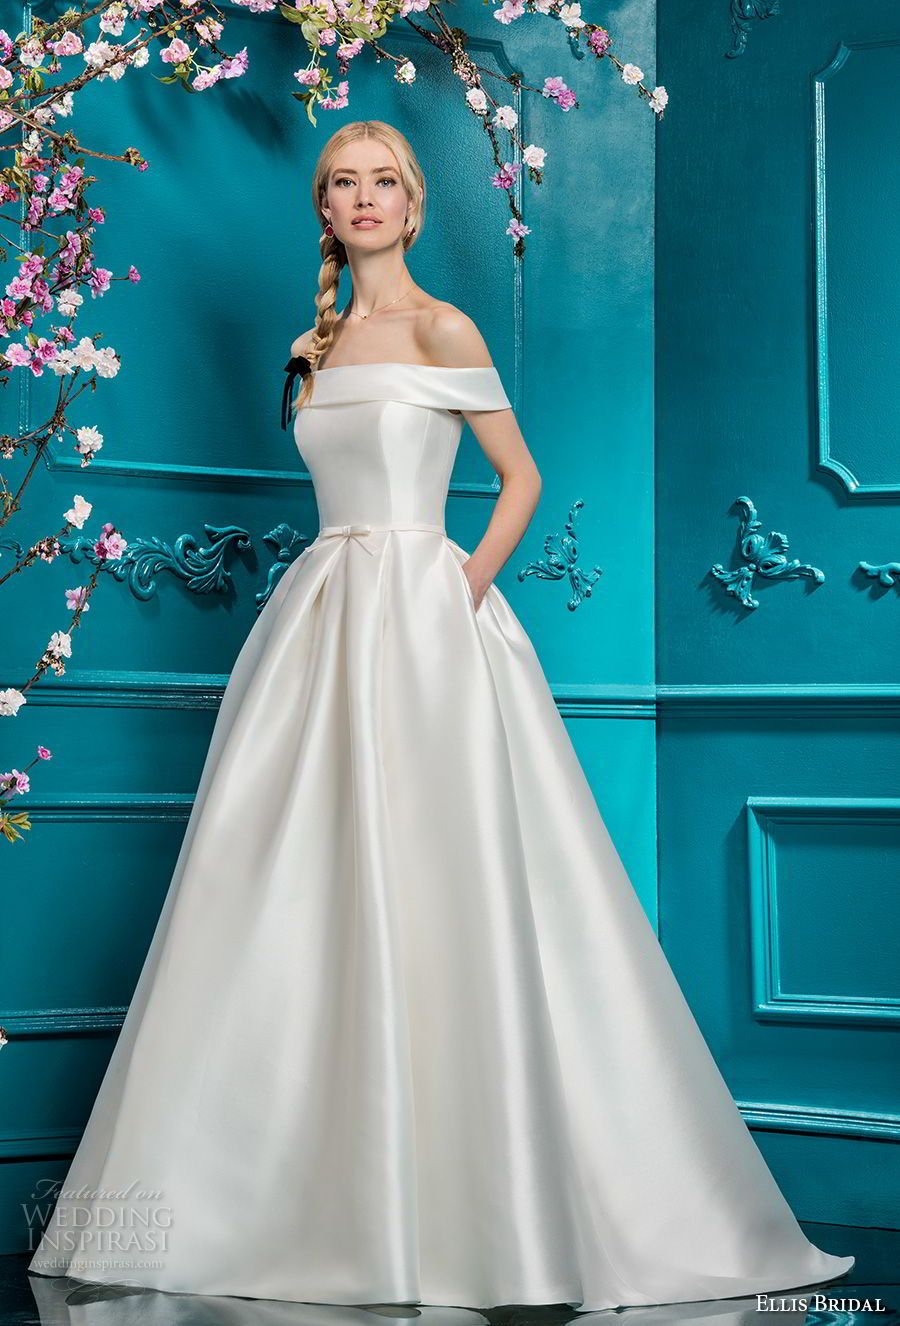 Ellis bridals wedding dresses u ucduskud bridal collection